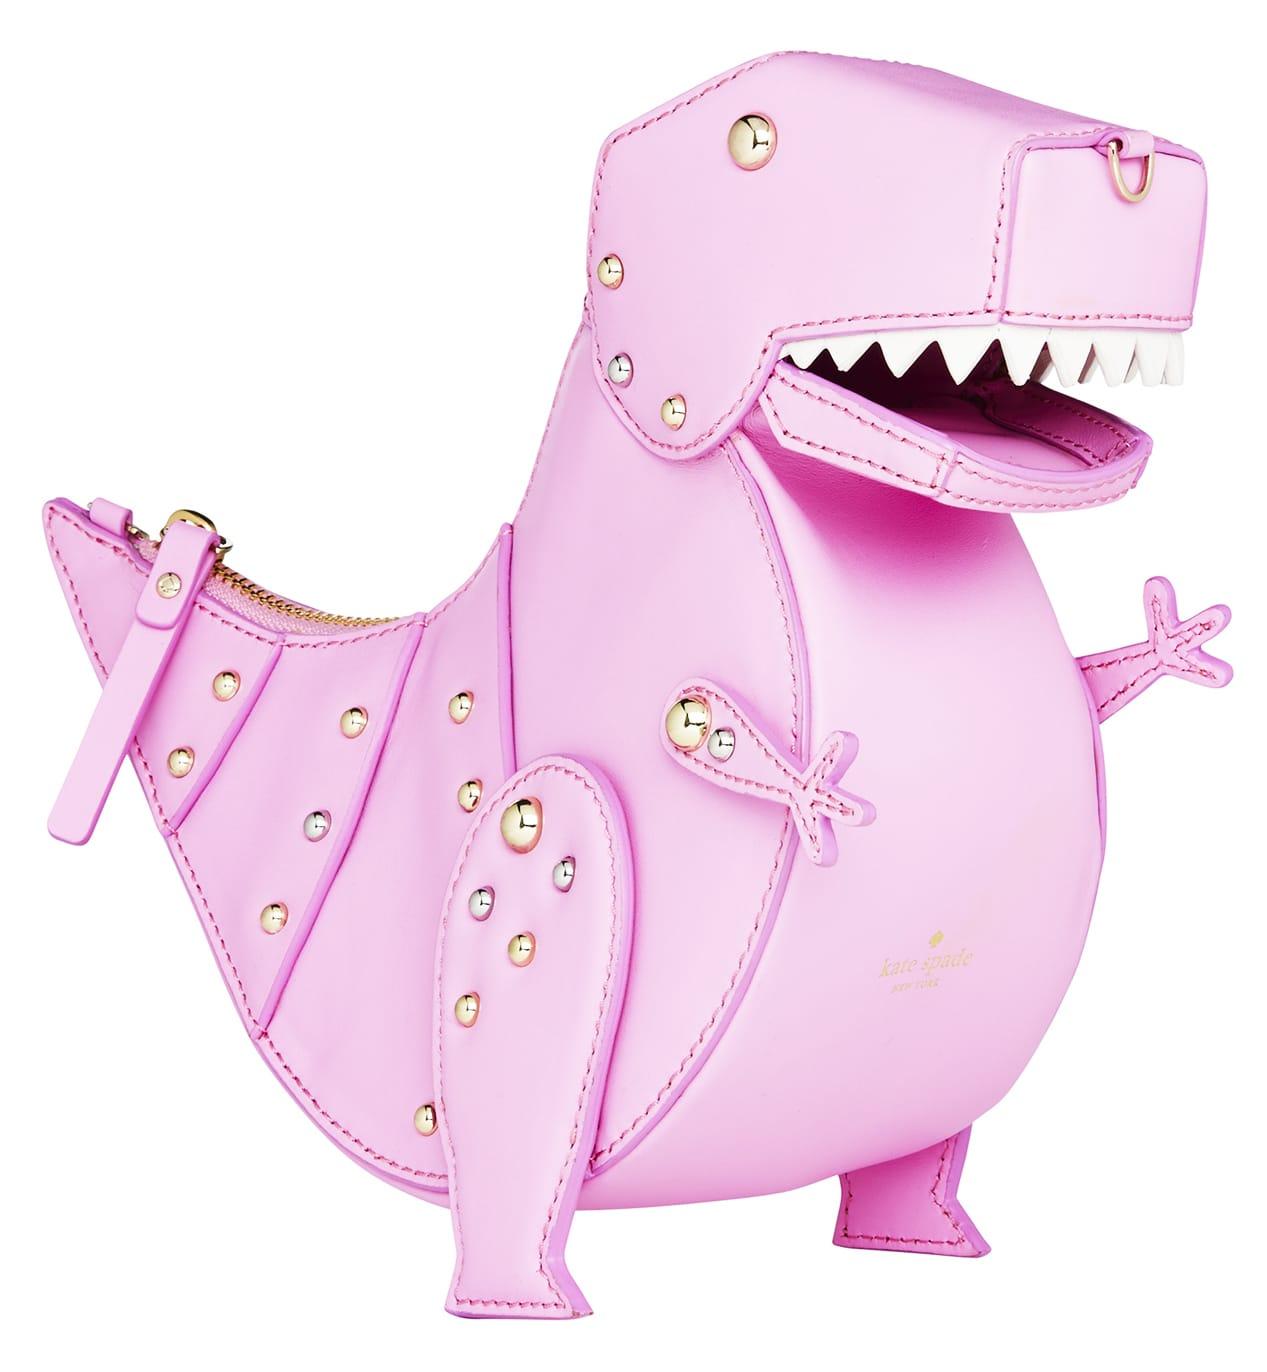 Kate Spade Dinosaur Purse Adds Some Ferocious Fun to Fashion 7c8069458